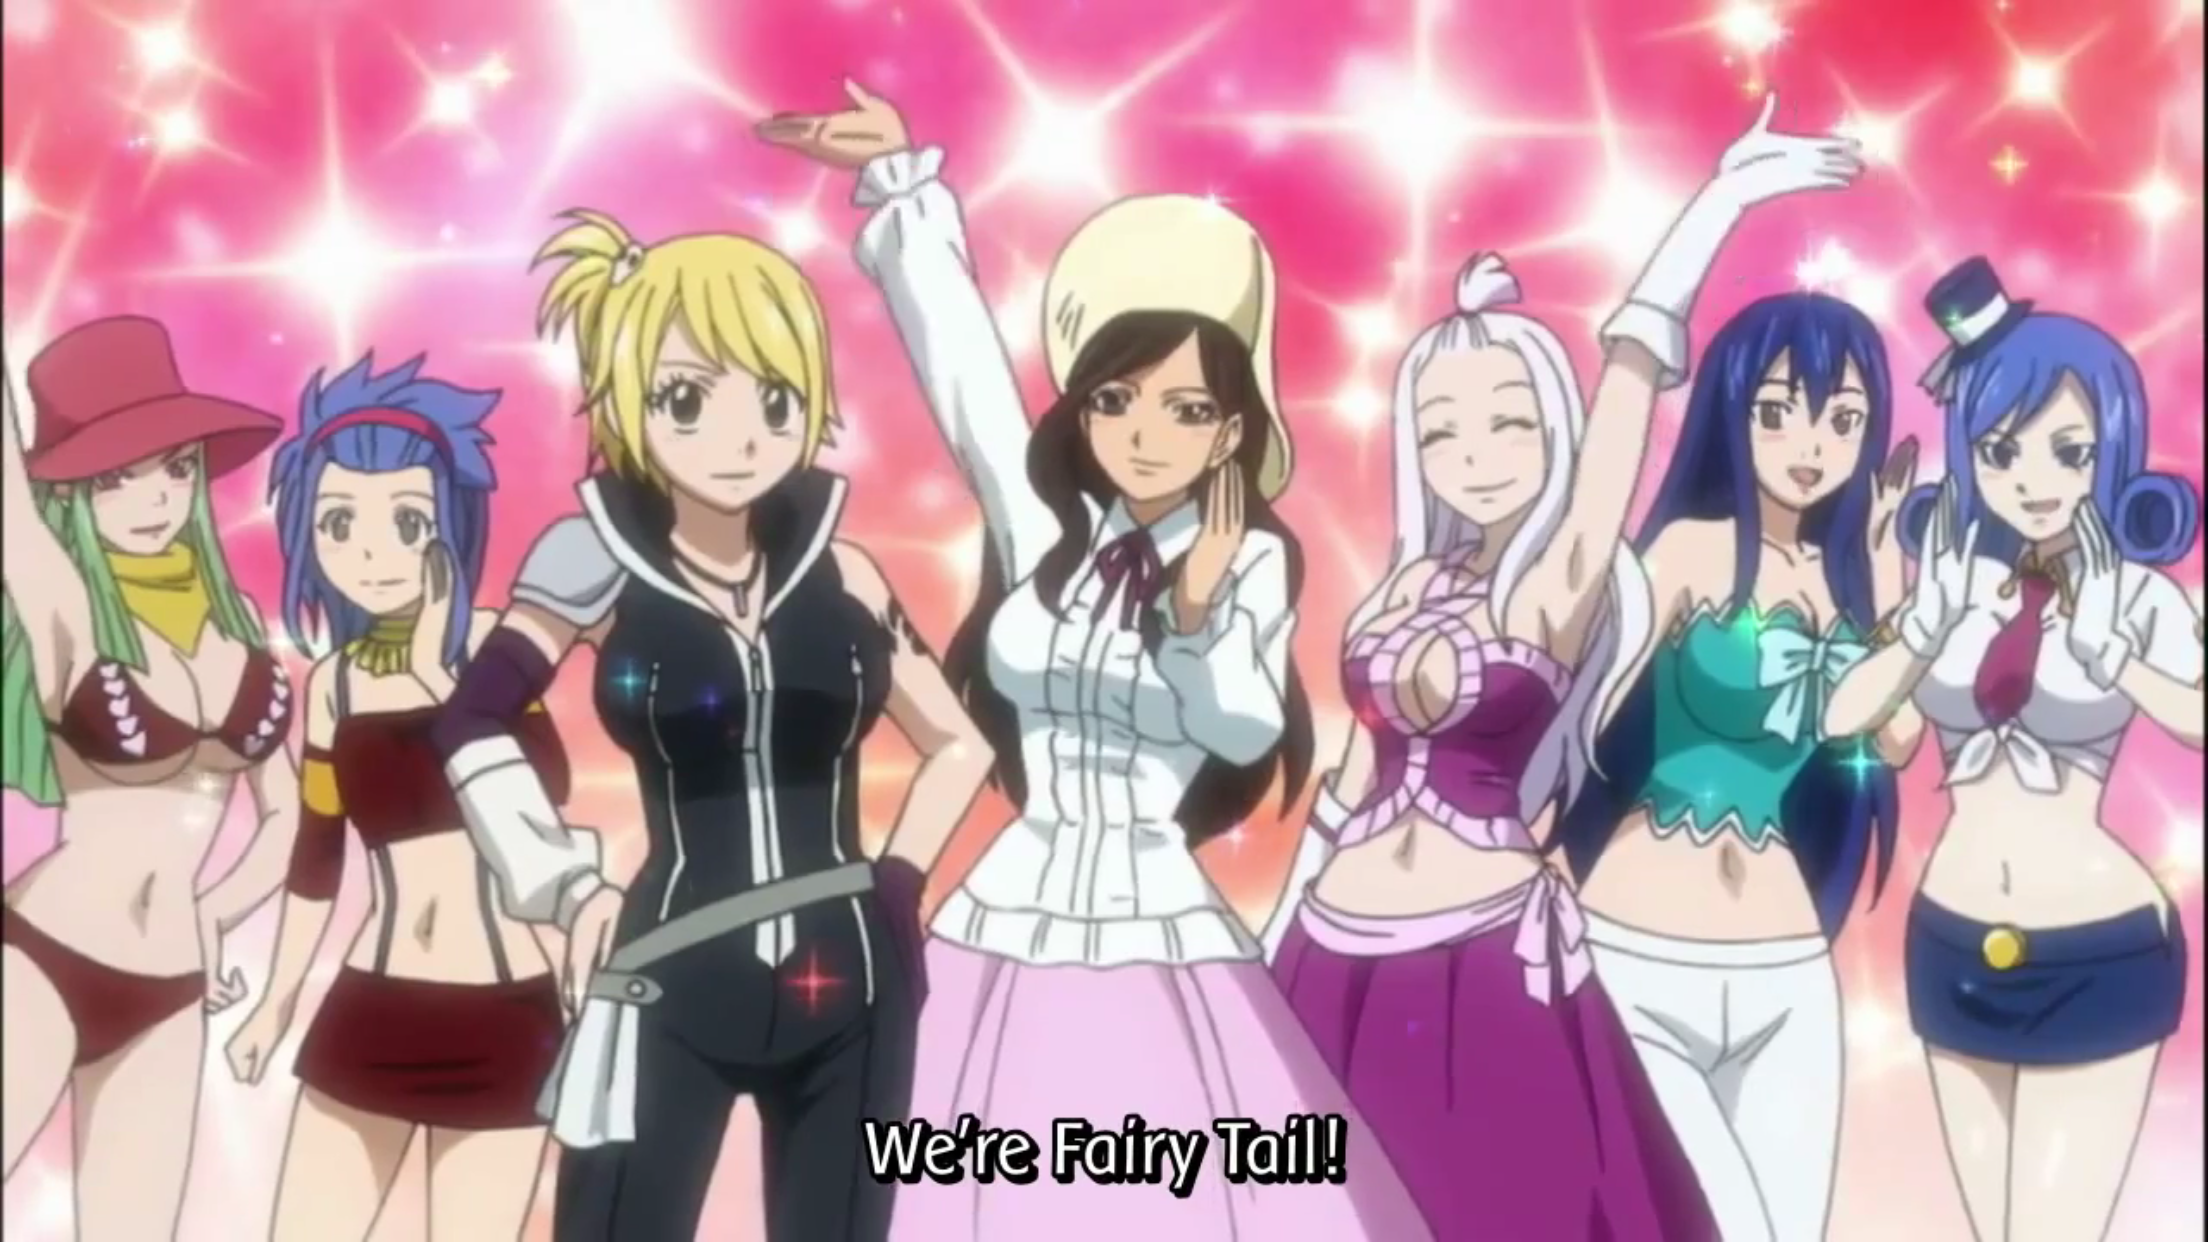 fairy tail episode 96 anime screencaps pinterest fairy